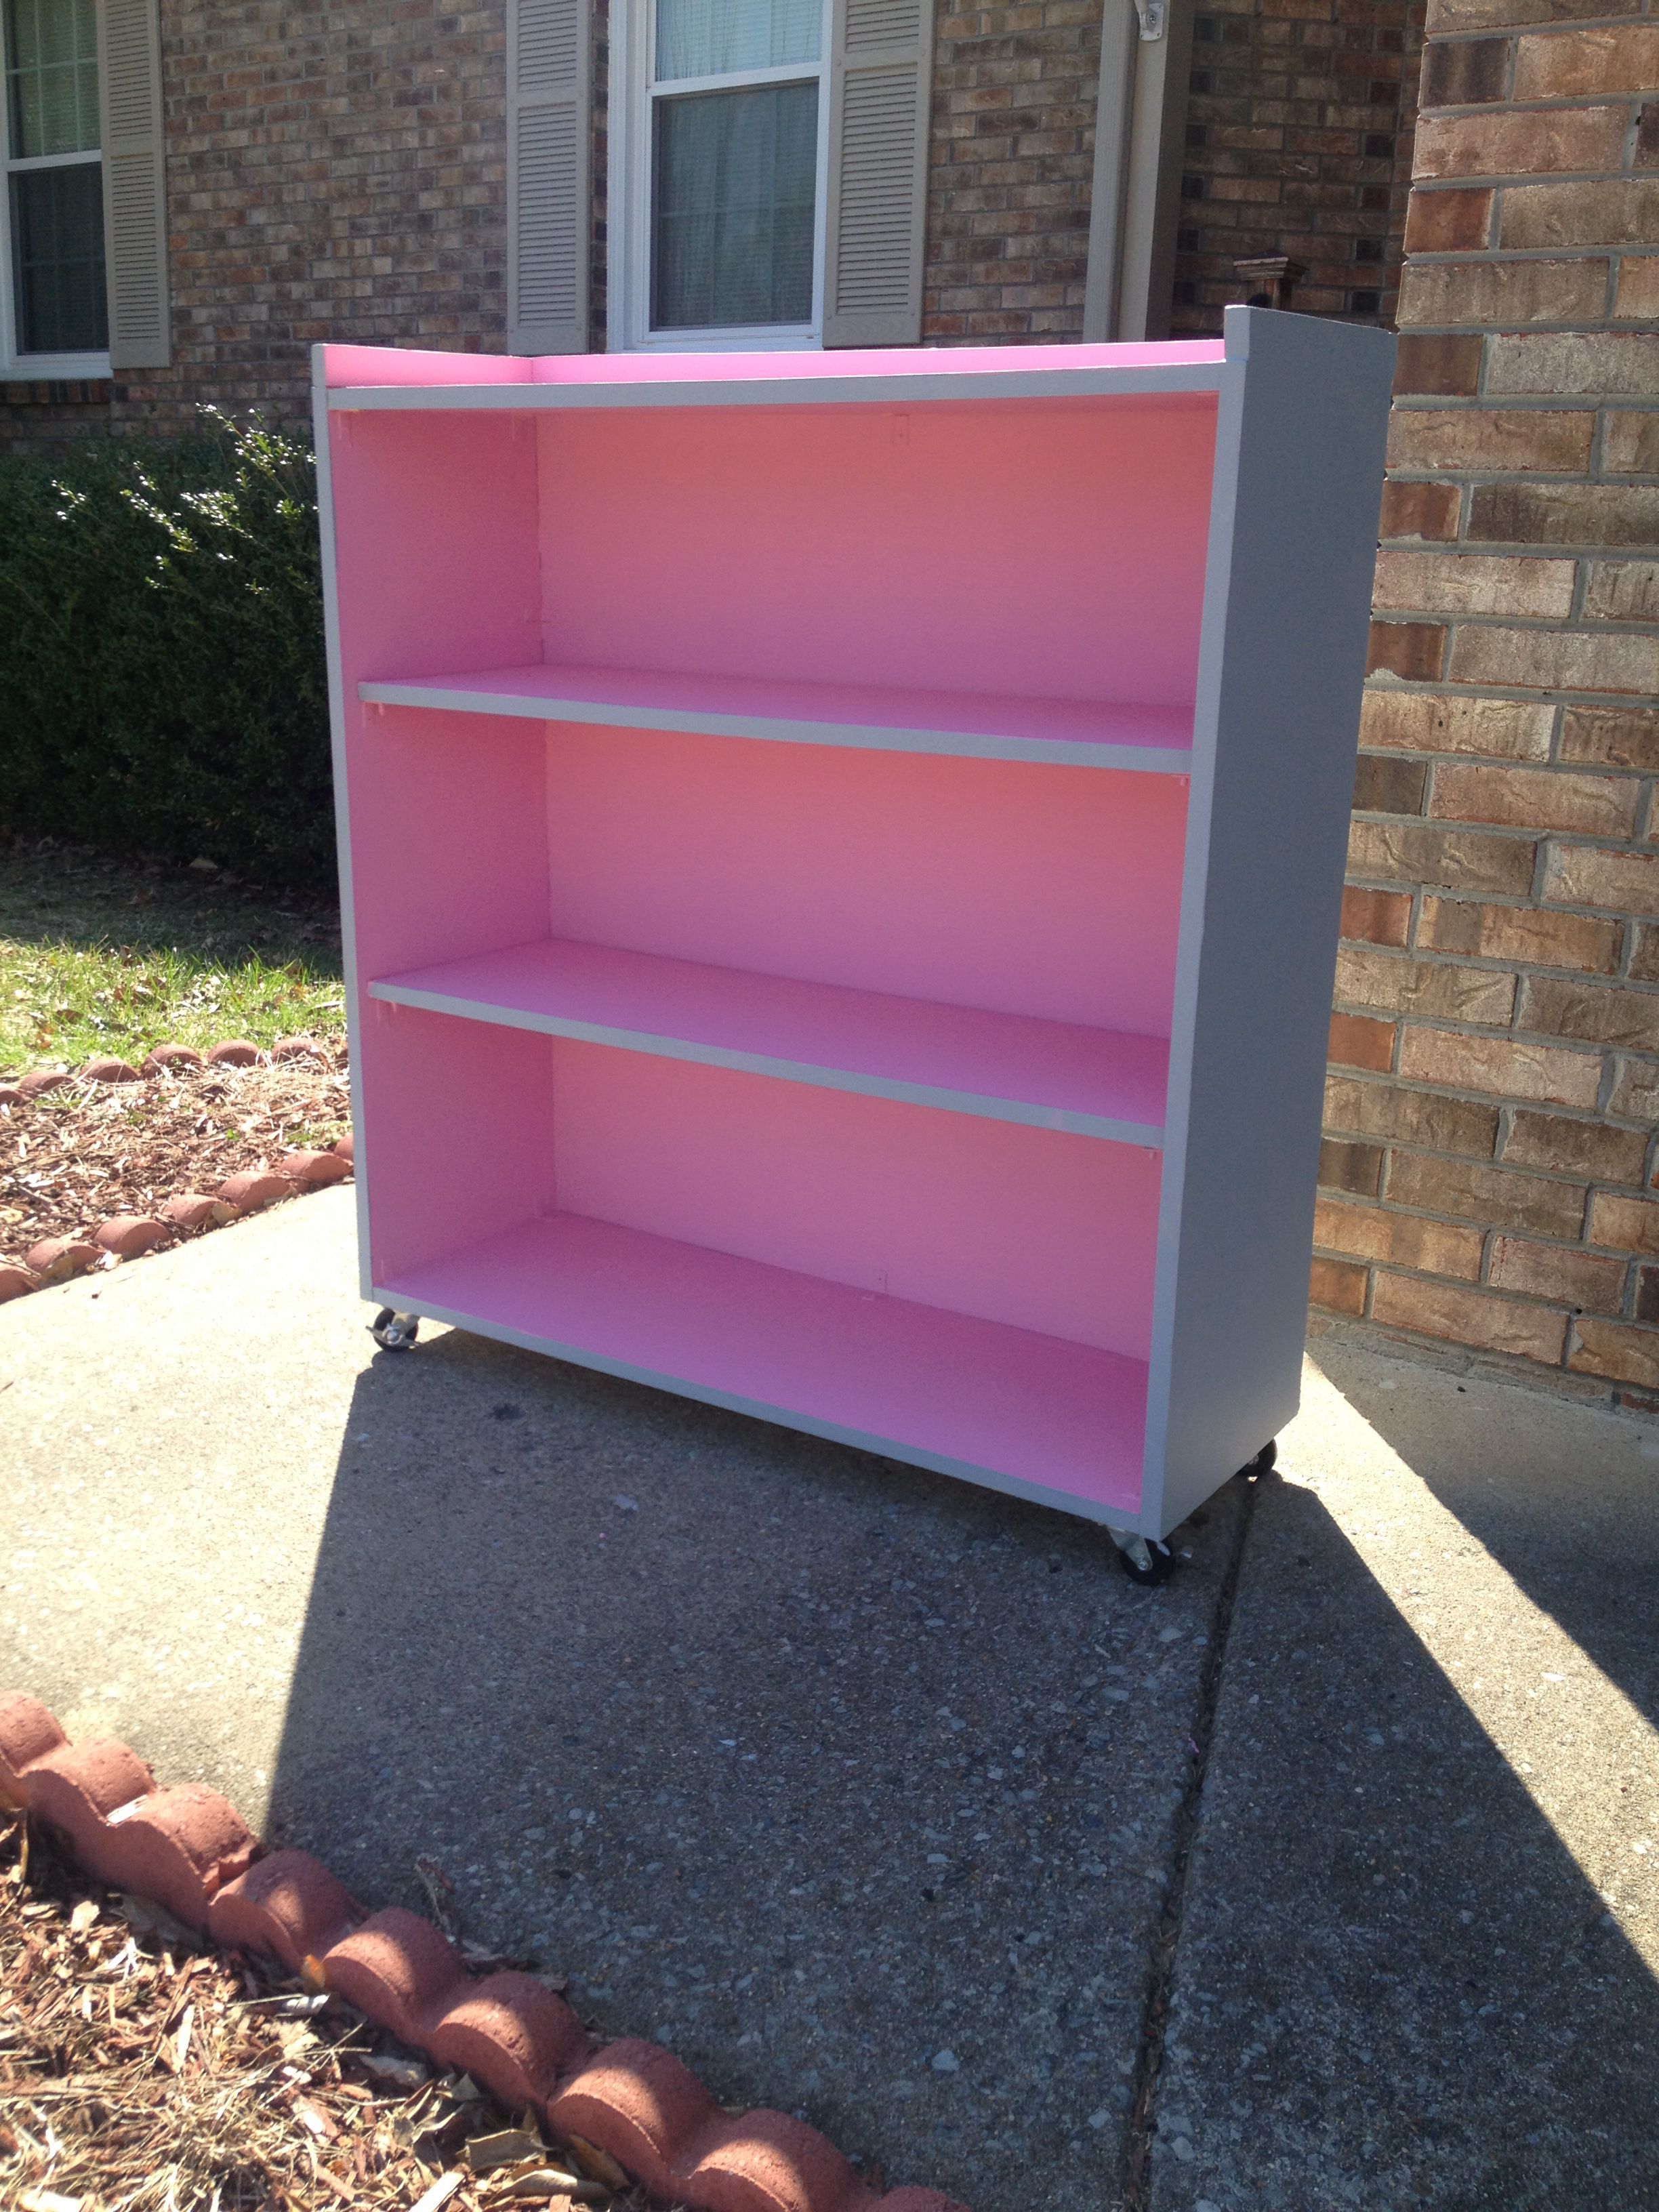 GLTC greenaway bookcase pink and grey girls room - A Baby ...  Pink And Grey Bookcase